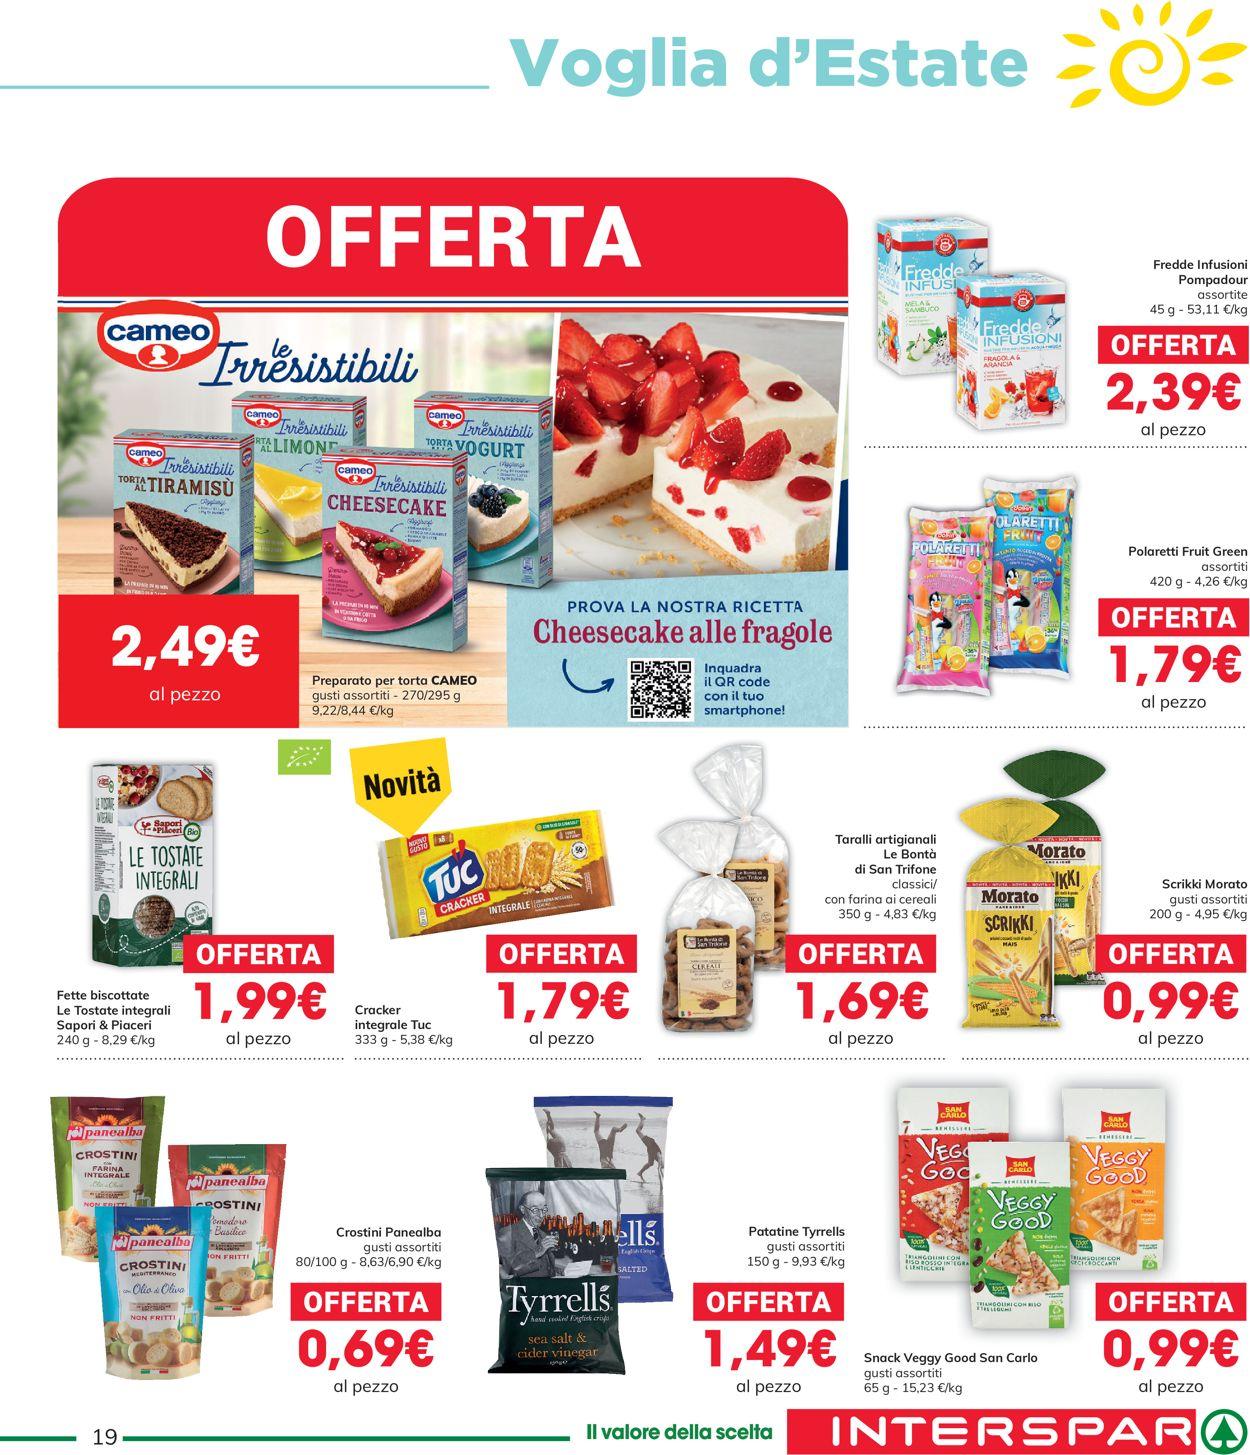 Volantino Interspar - Offerte 27/05-09/06/2021 (Pagina 19)